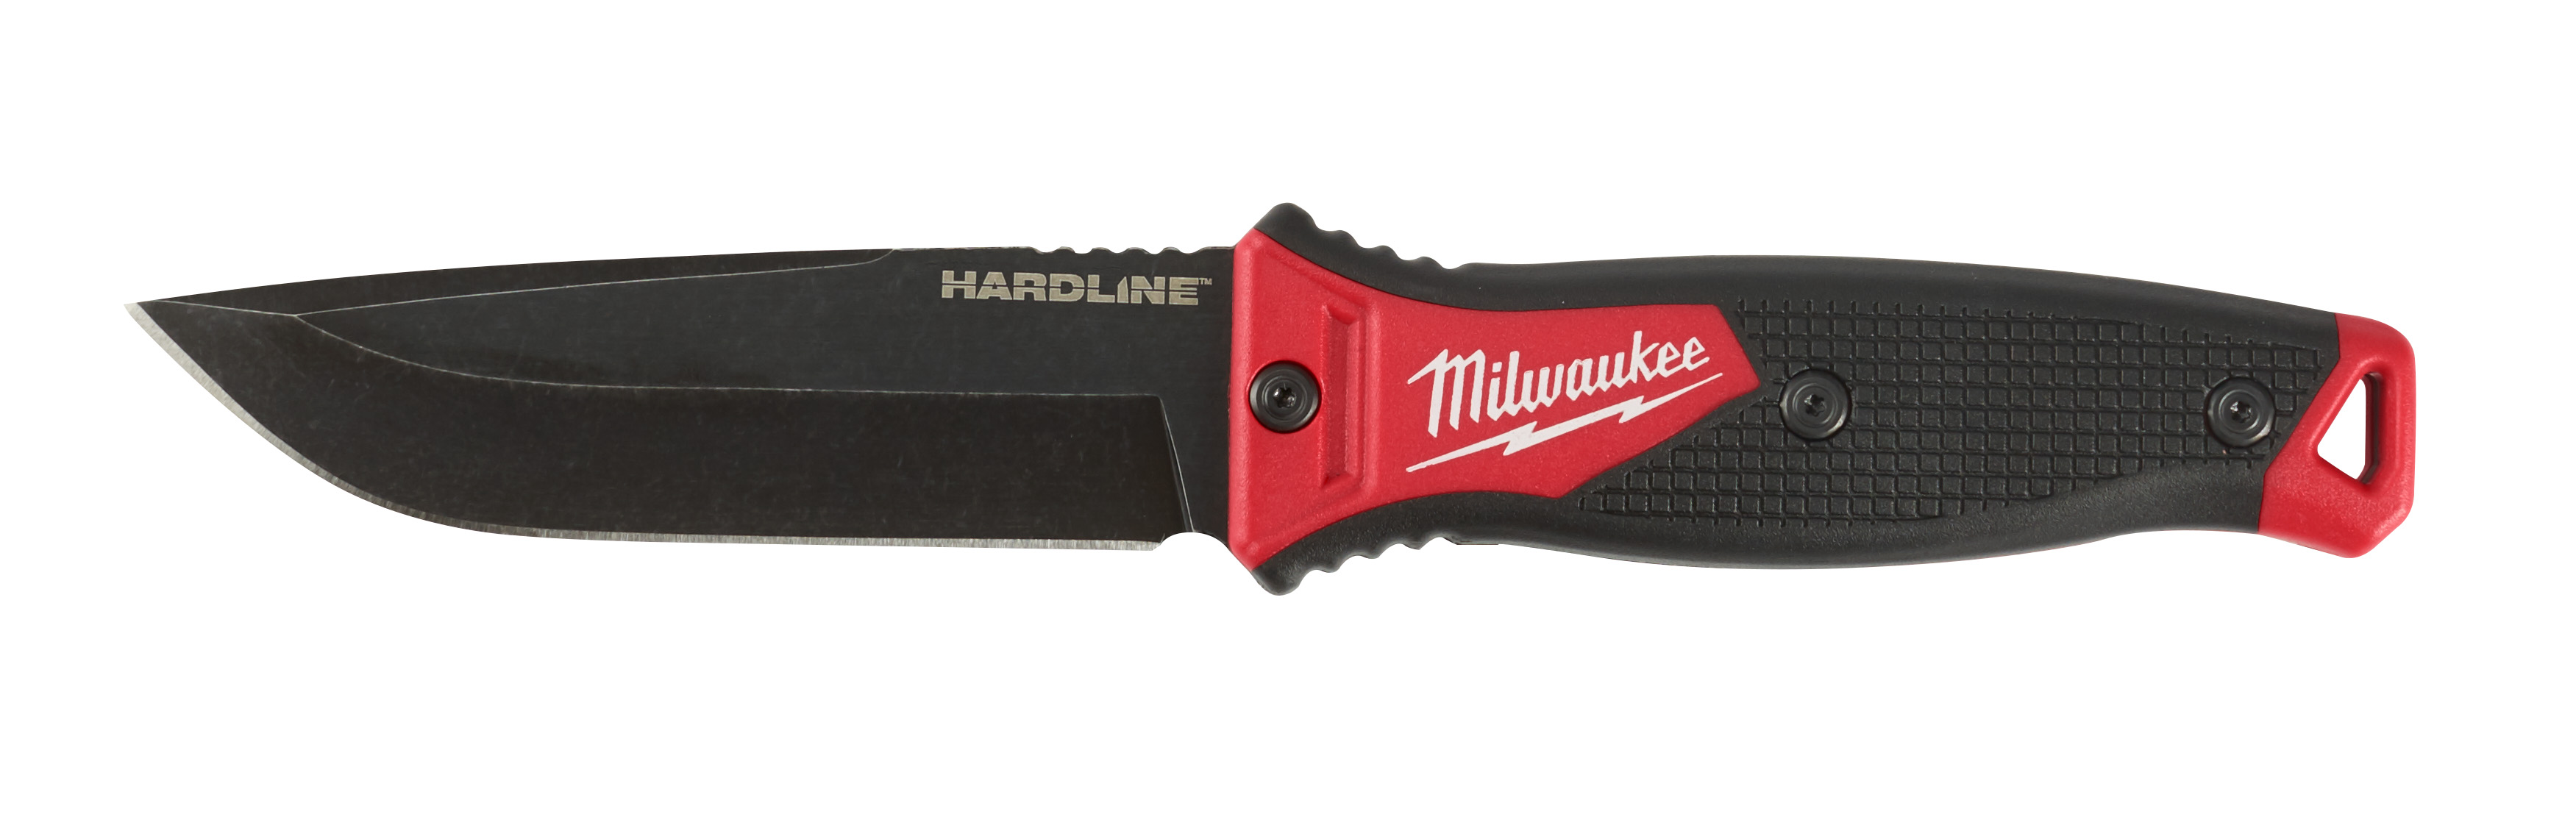 Milwaukee® HARDLINE™ 48-22-1928 Fixed Blade Knife, 0.8 in W, AUS-8 Steel